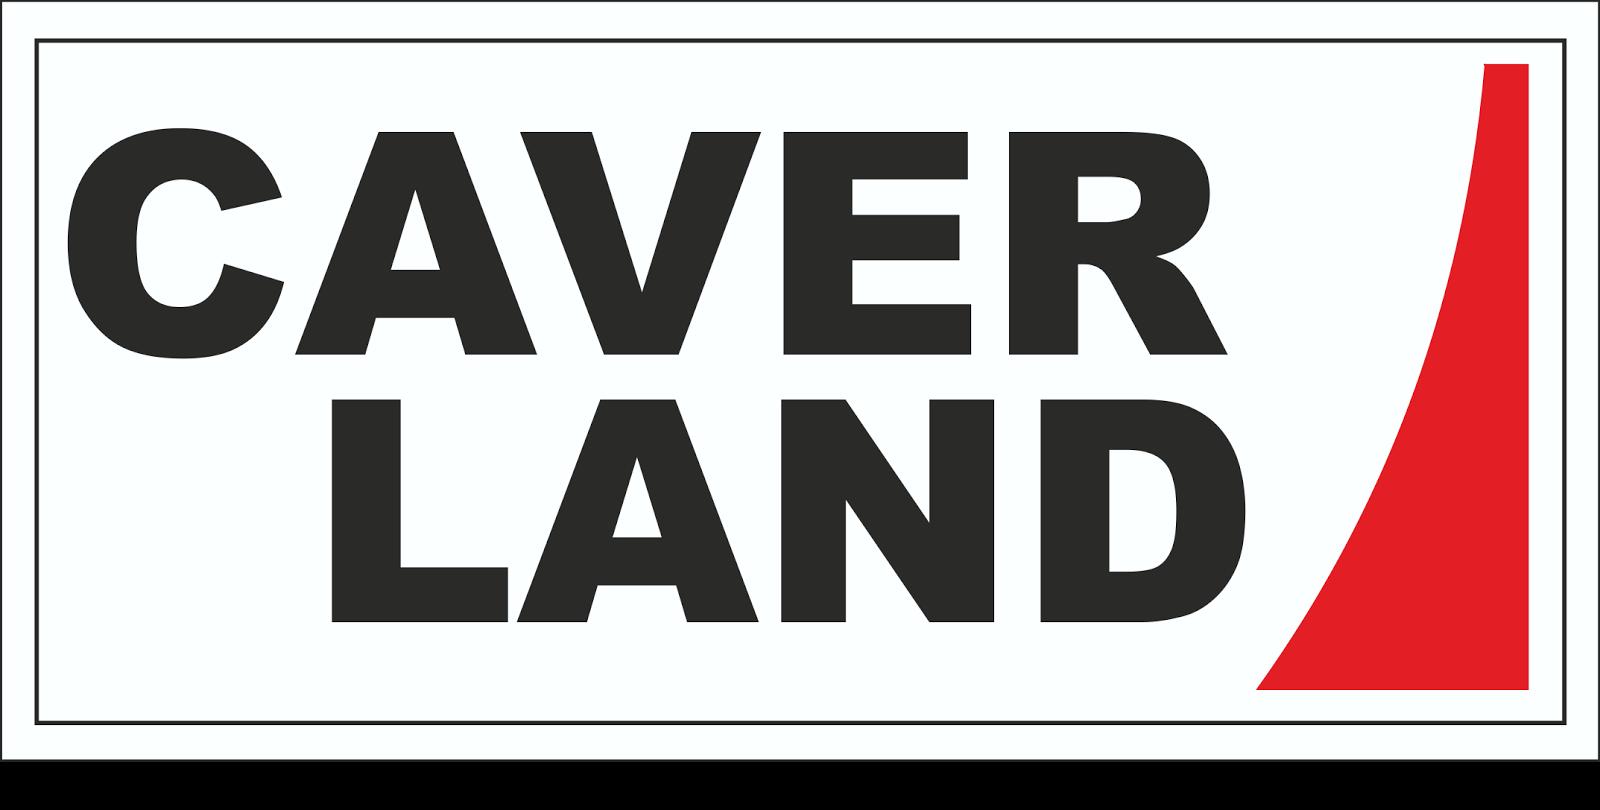 CAVERLAND